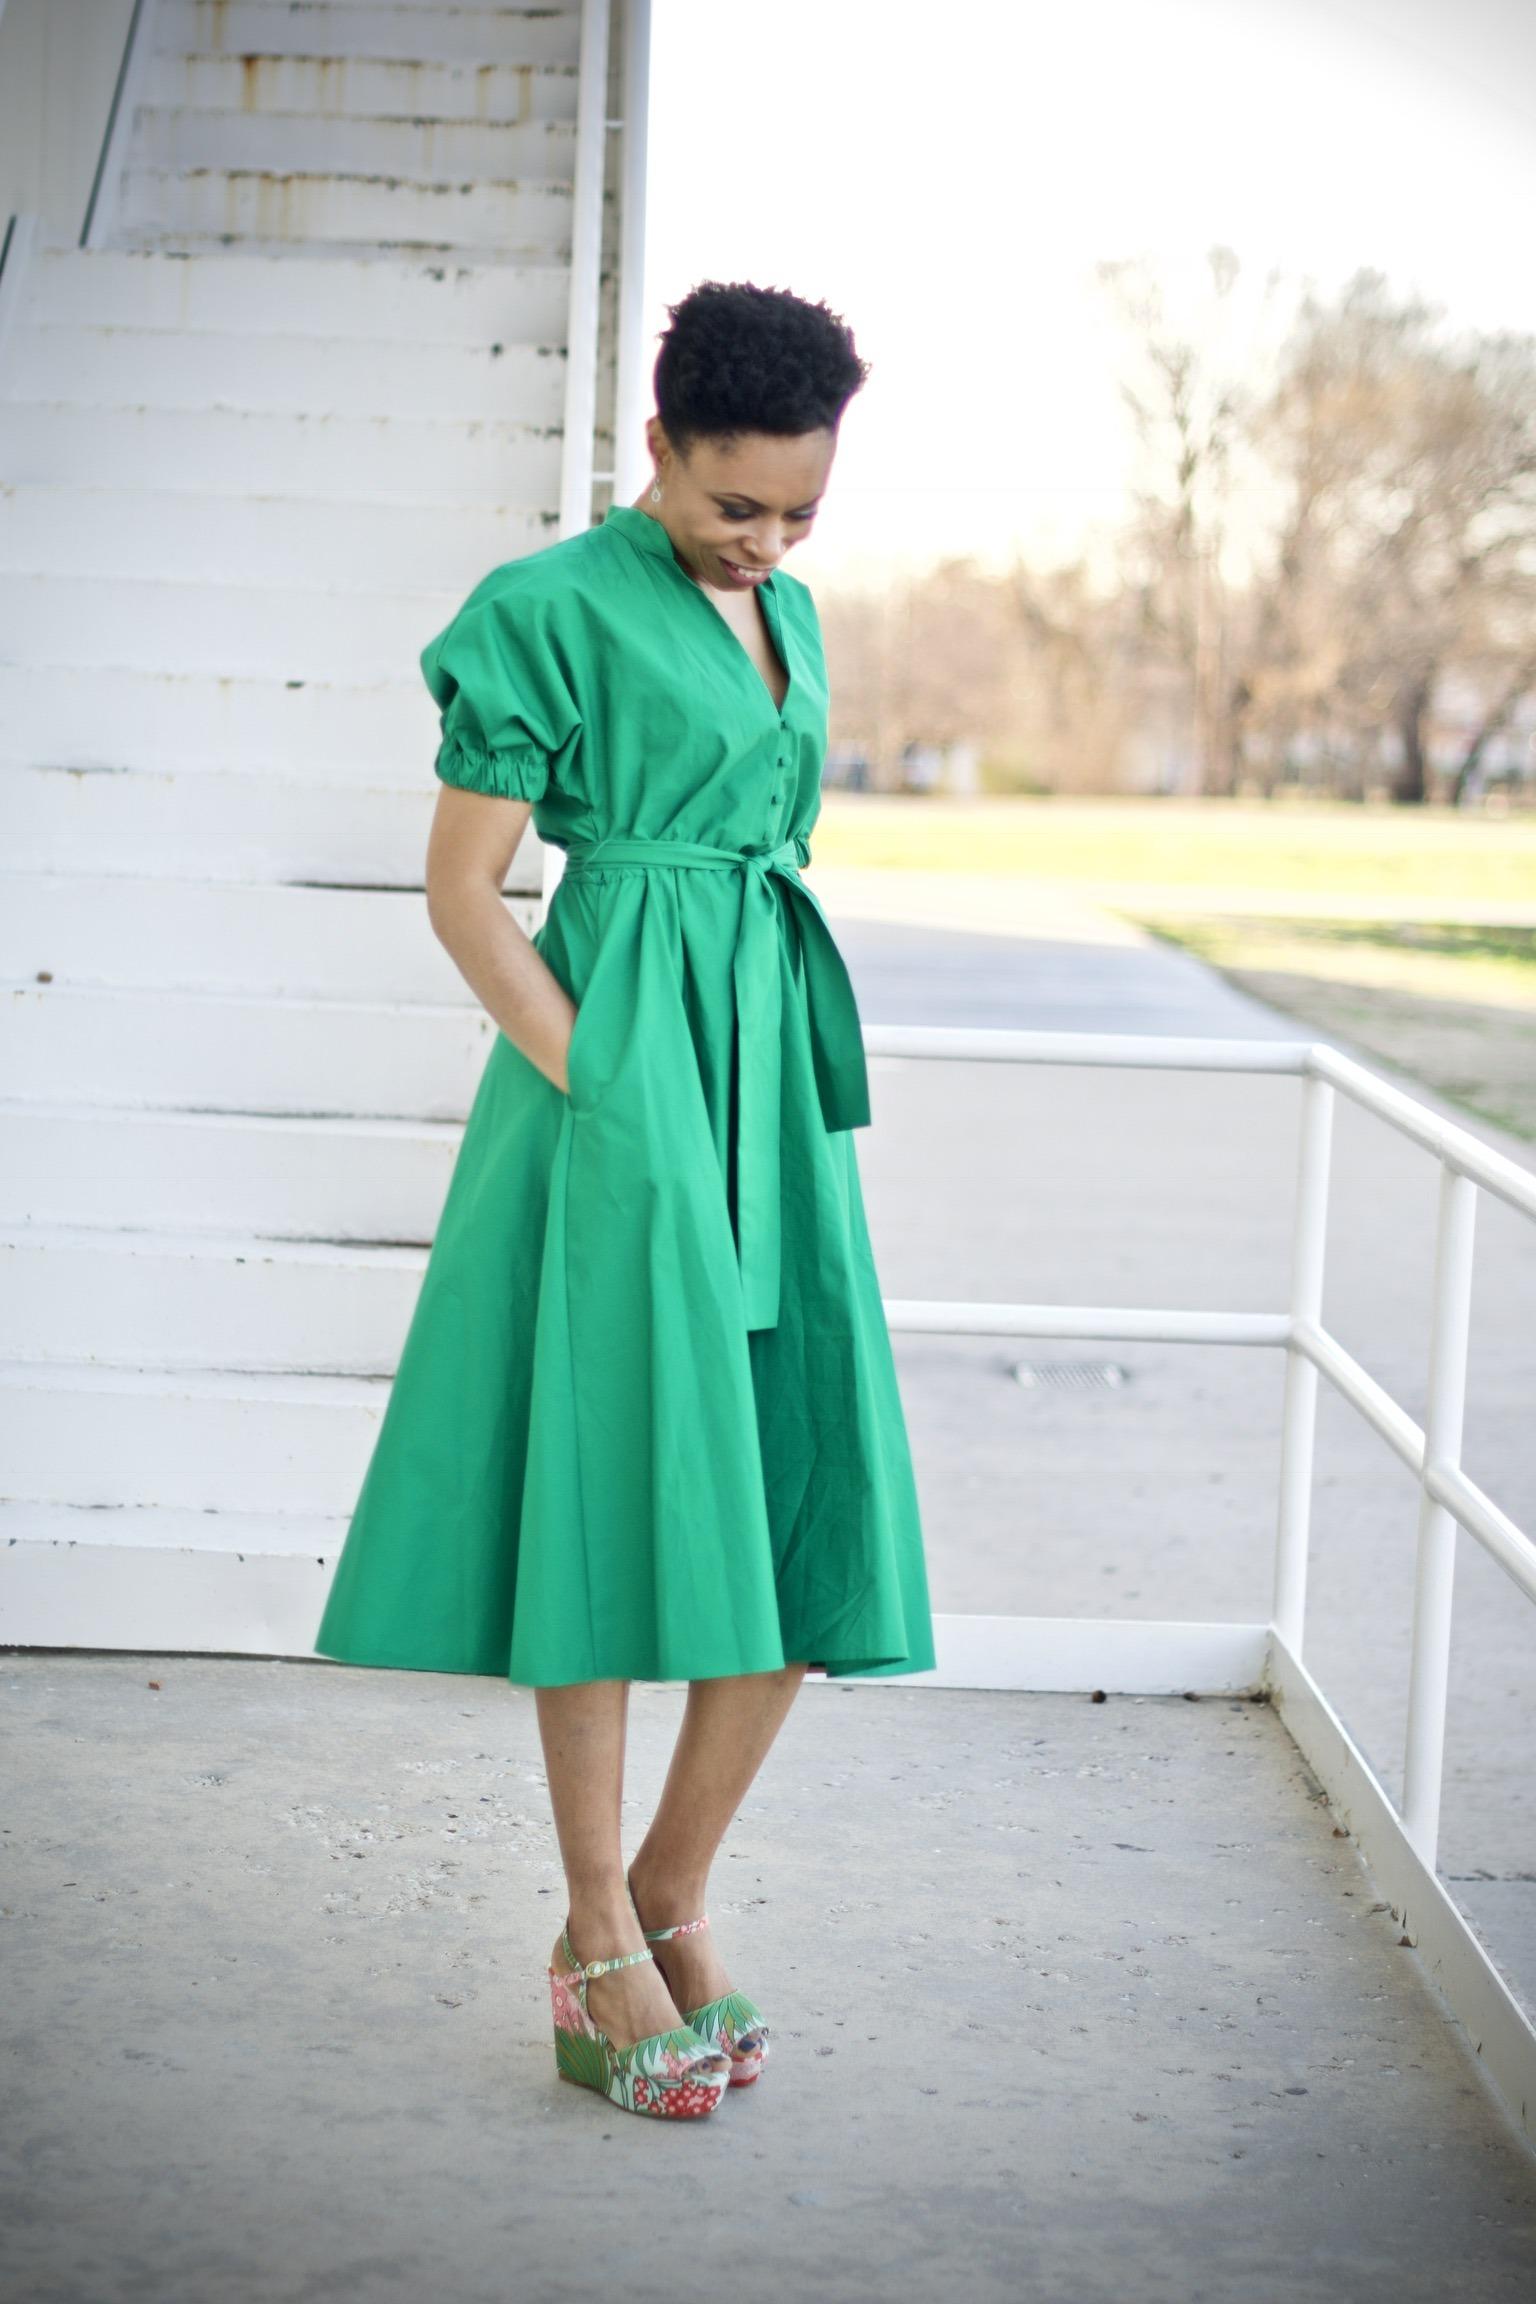 Midi dress + Floral wedge heels for spring